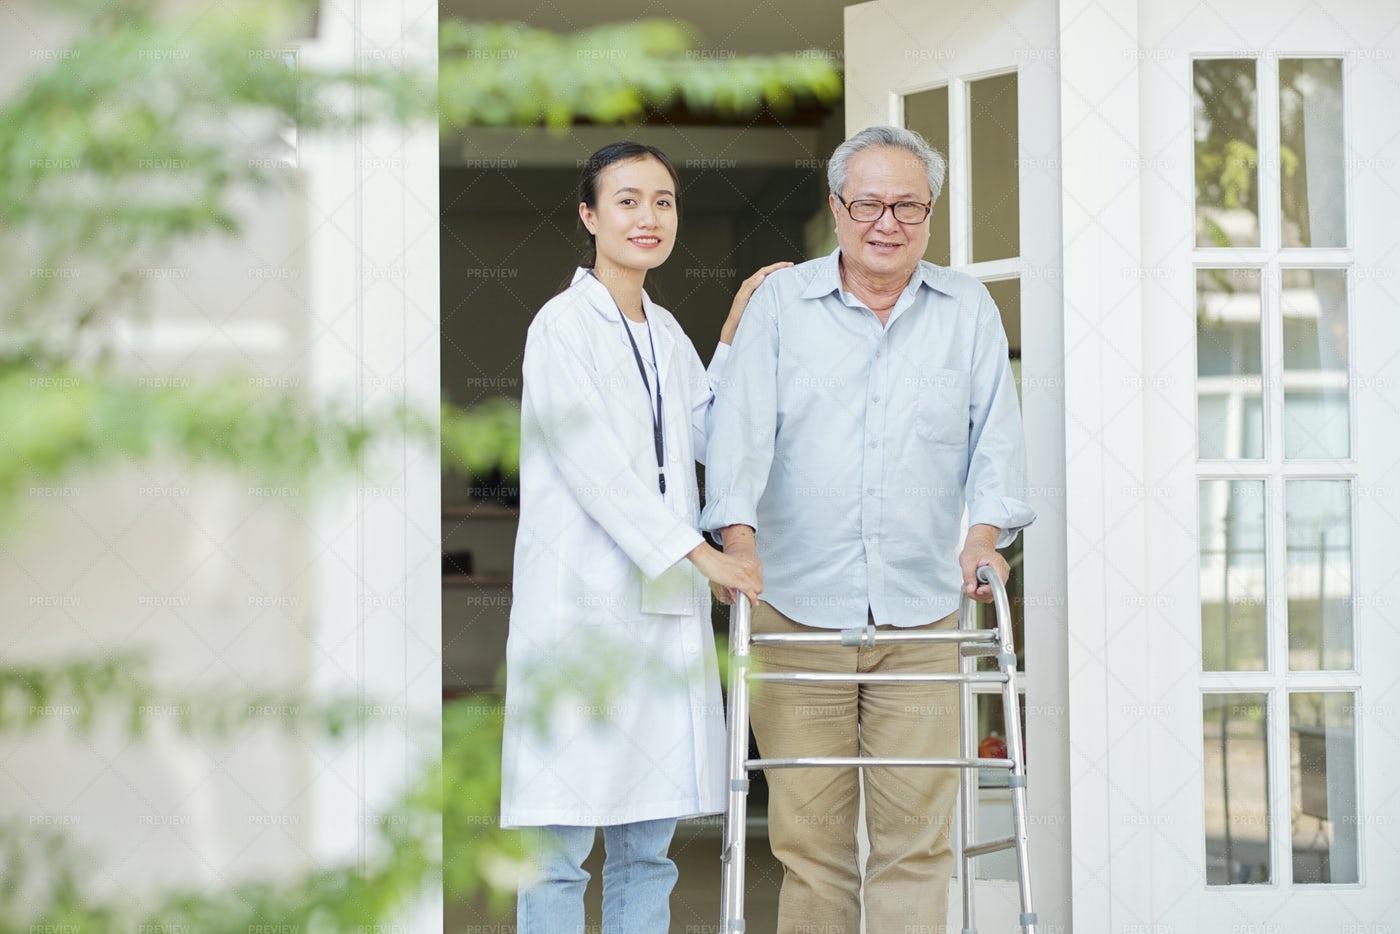 Man At Nursing Home: Stock Photos